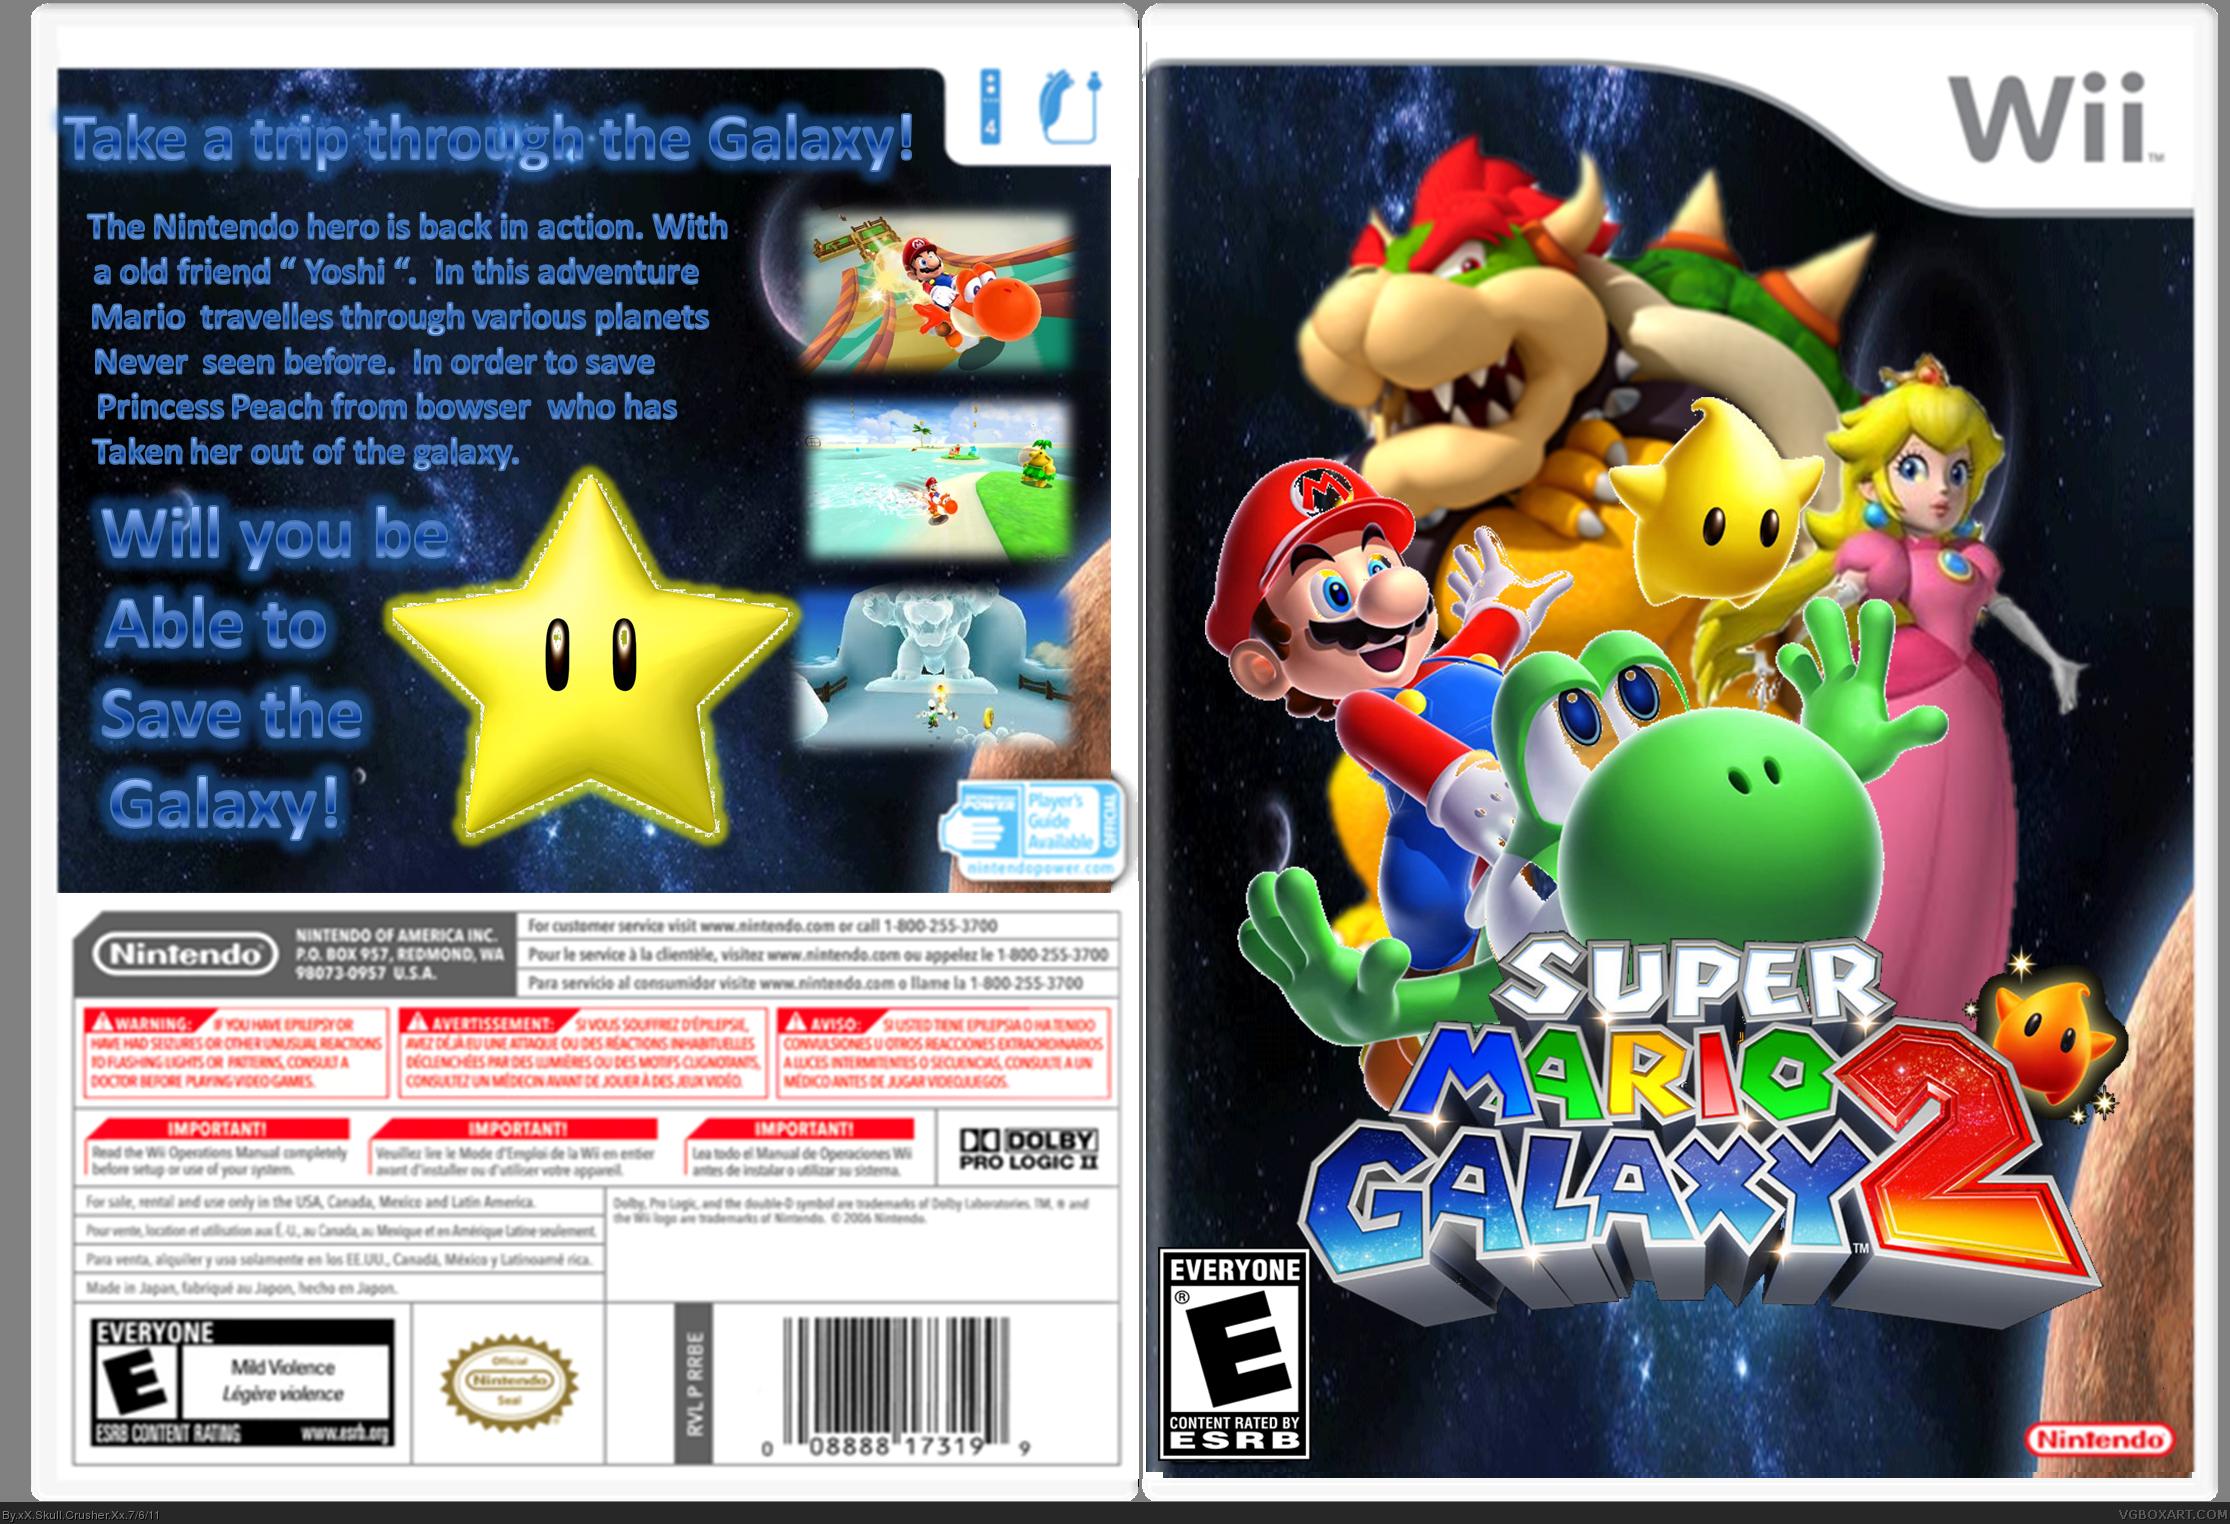 Genesis 38 8 >> Super Mario Galaxy 2 Wii Box Art Cover by xX Skull Crusher Xx